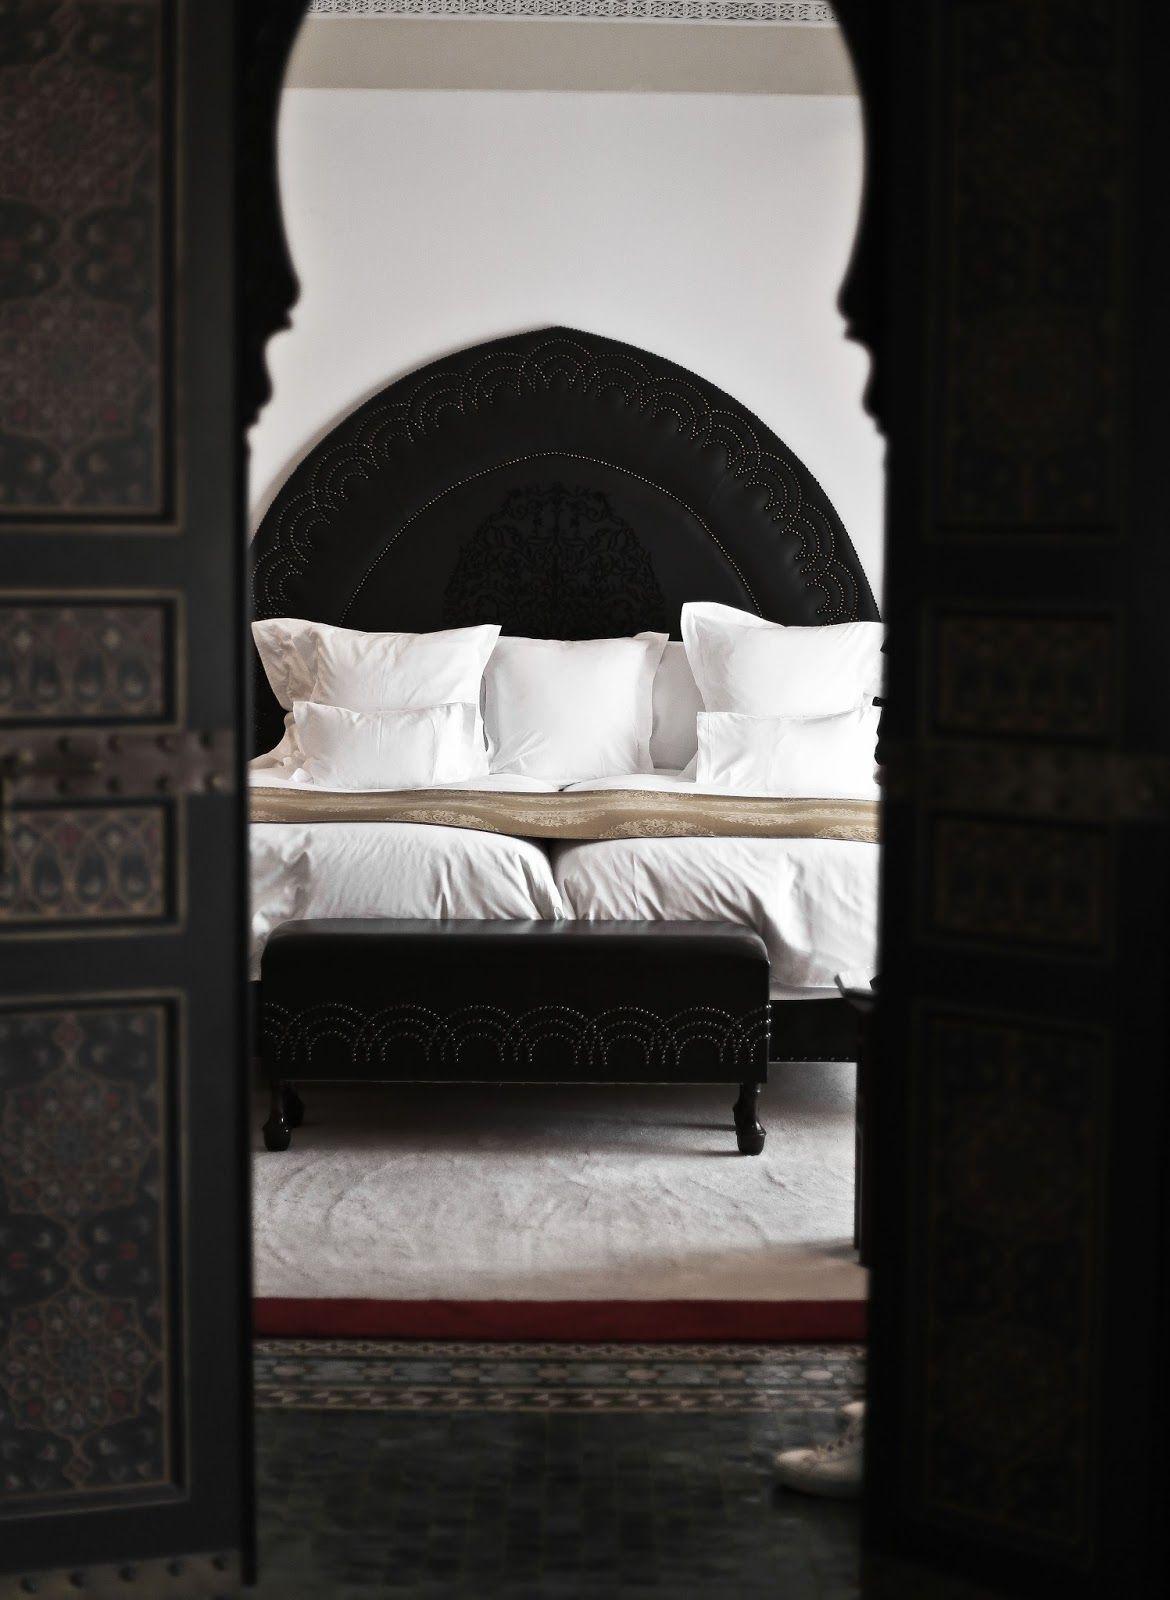 La mamounia la mamounia blog la mamounia marrakech la mamounia hotel review trip travel - Prix chambre hotel mamounia marrakech ...